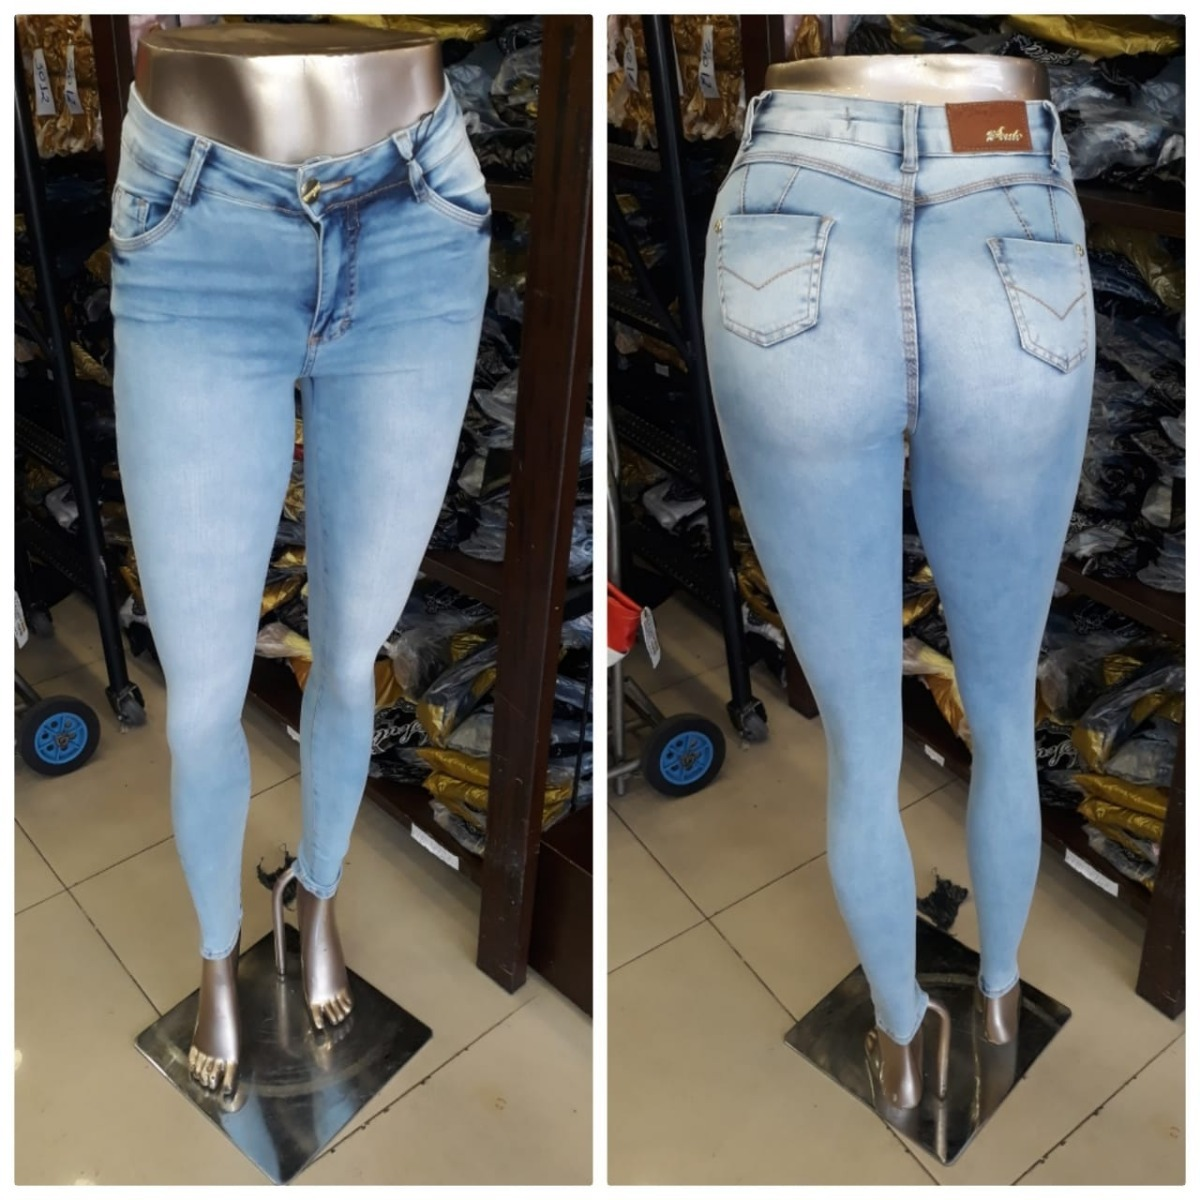 84eea163f Calça Skinny Azul Claro Manchada Scute Jeans Referencia:3240 - R$ 78 ...